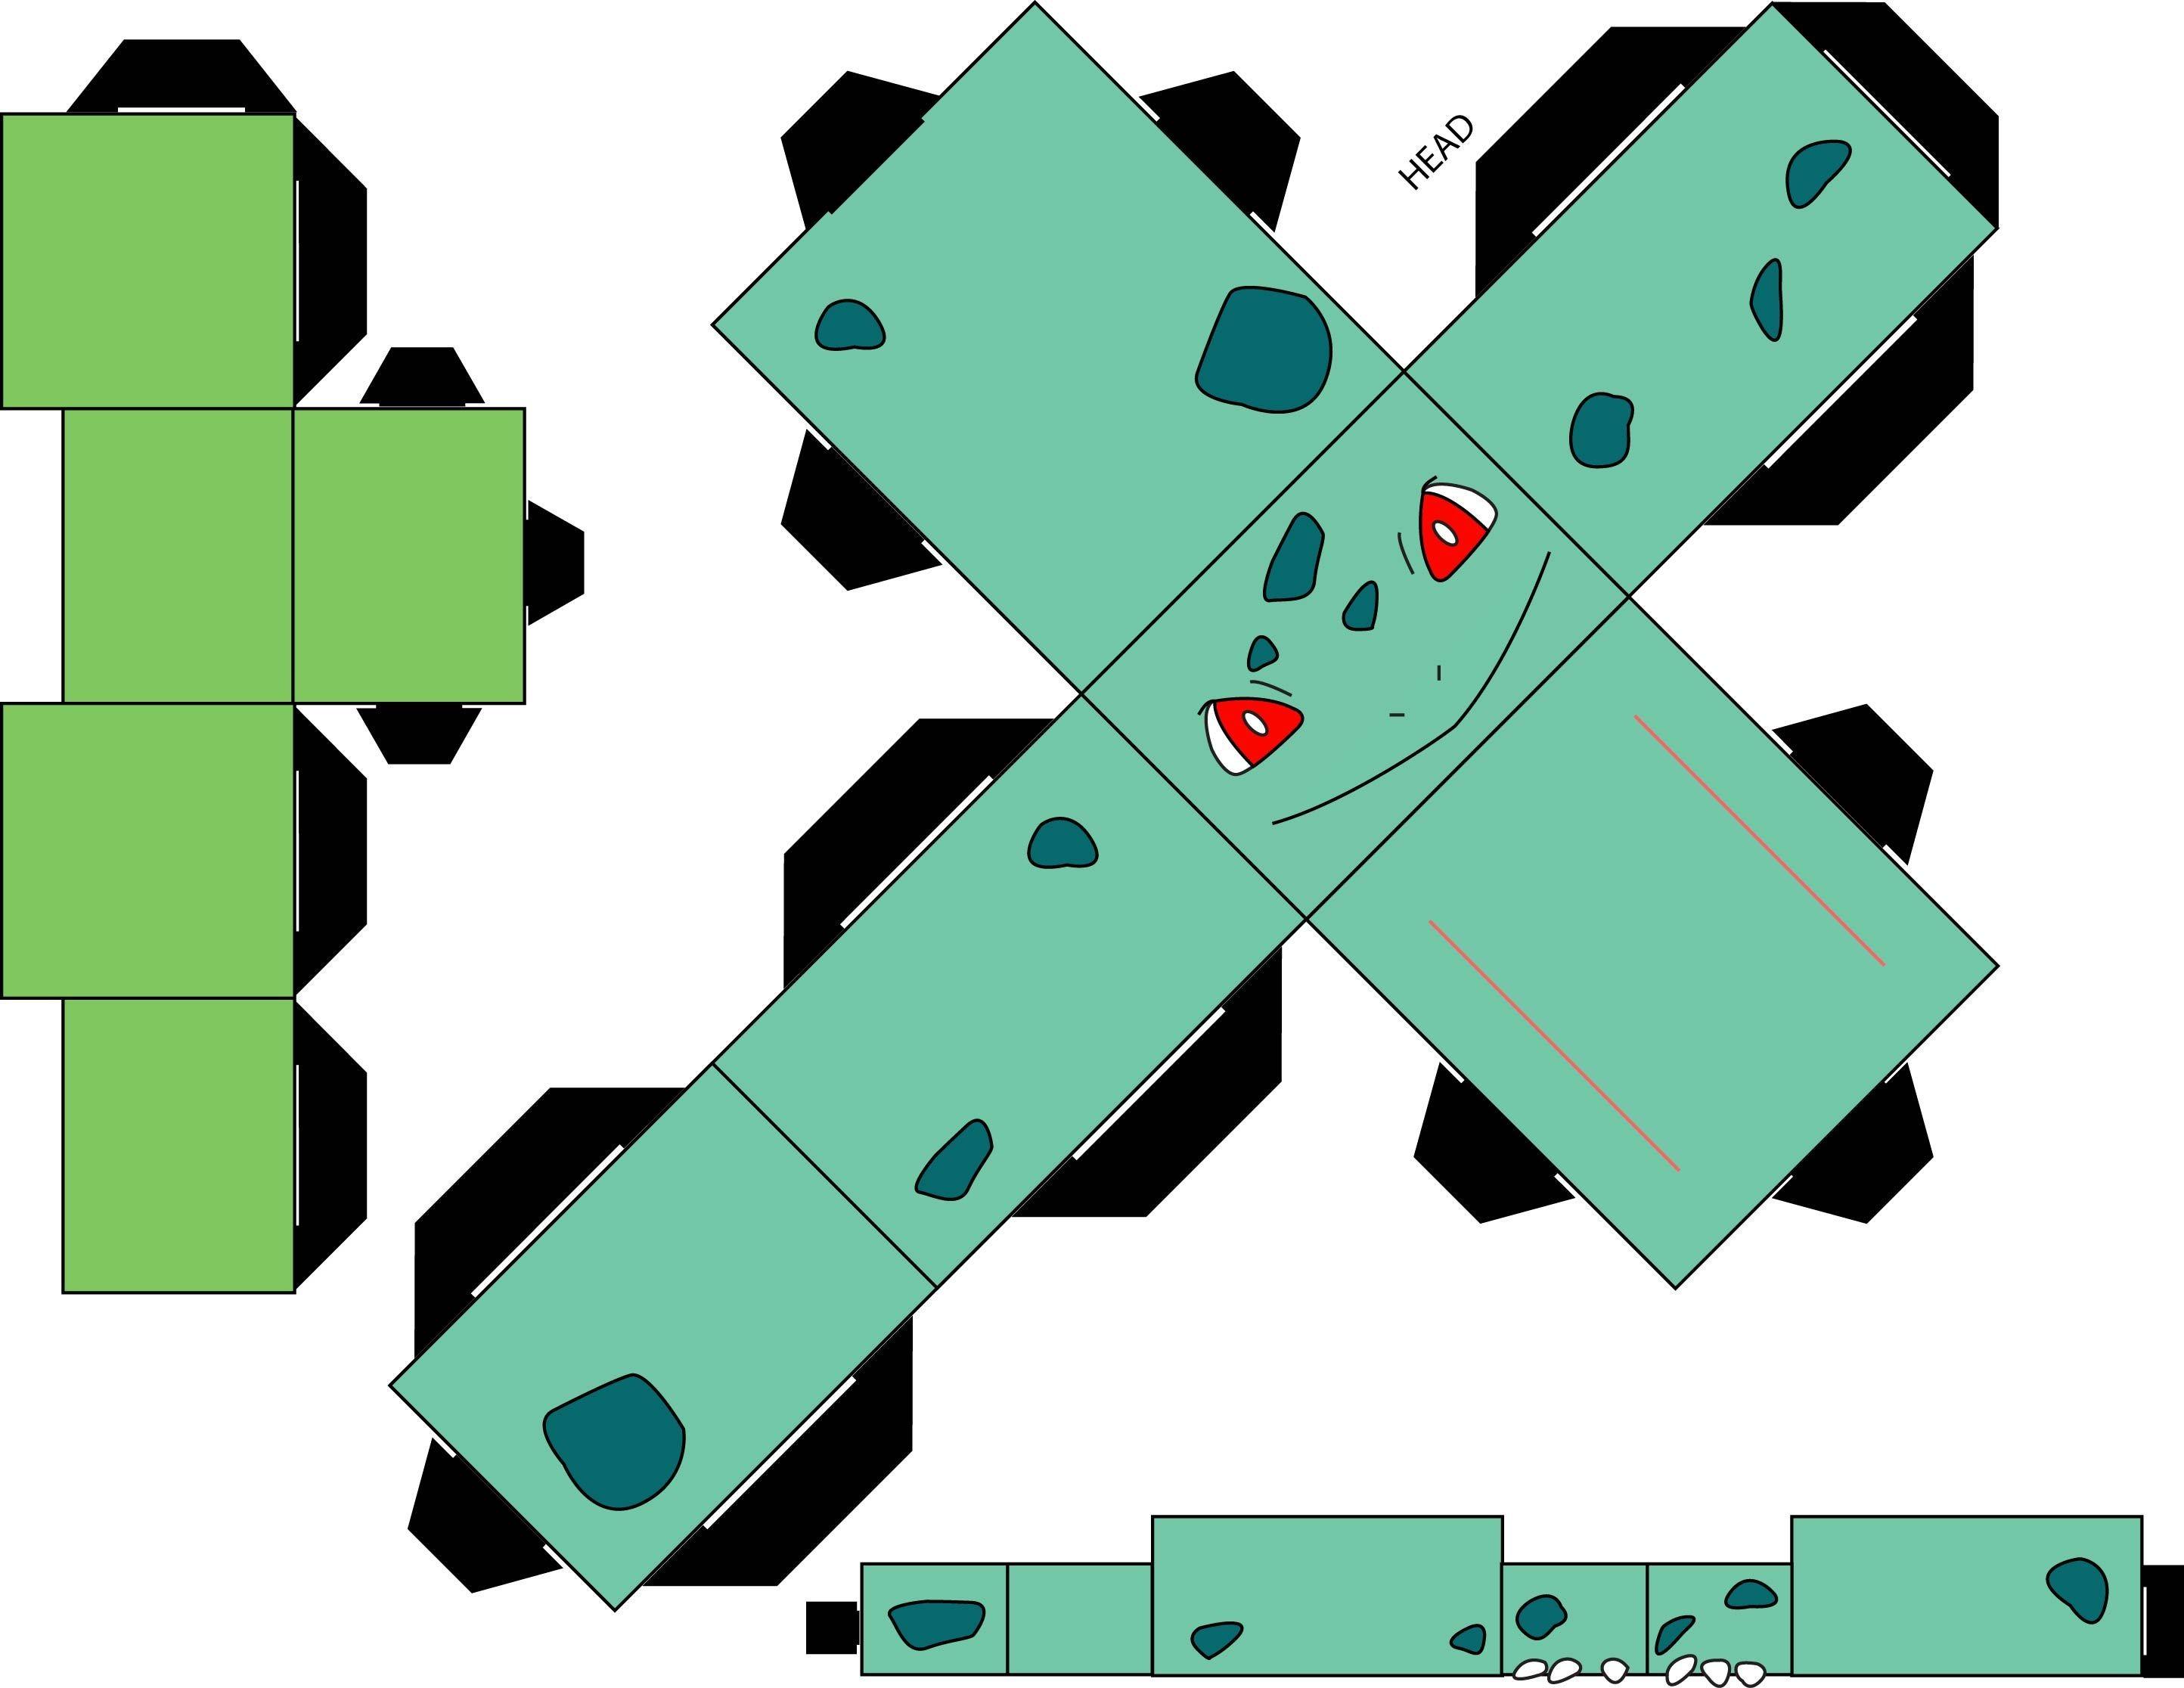 Vaporeon Papercraft Pokemon 001 Bulbasaur by Straffehond D35l3oy 2 888—2 232